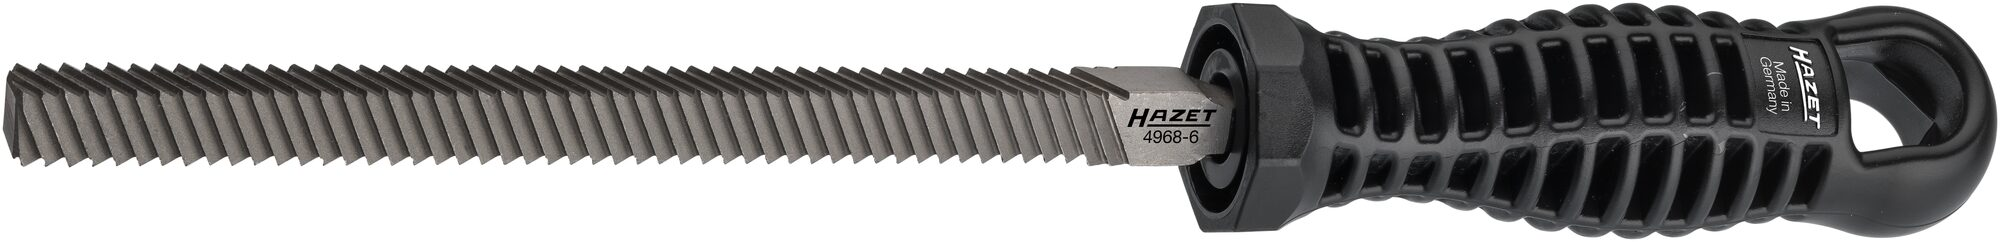 HAZET Vierkant Bremssattel-Feile 4968-6 ∙ 265 mm